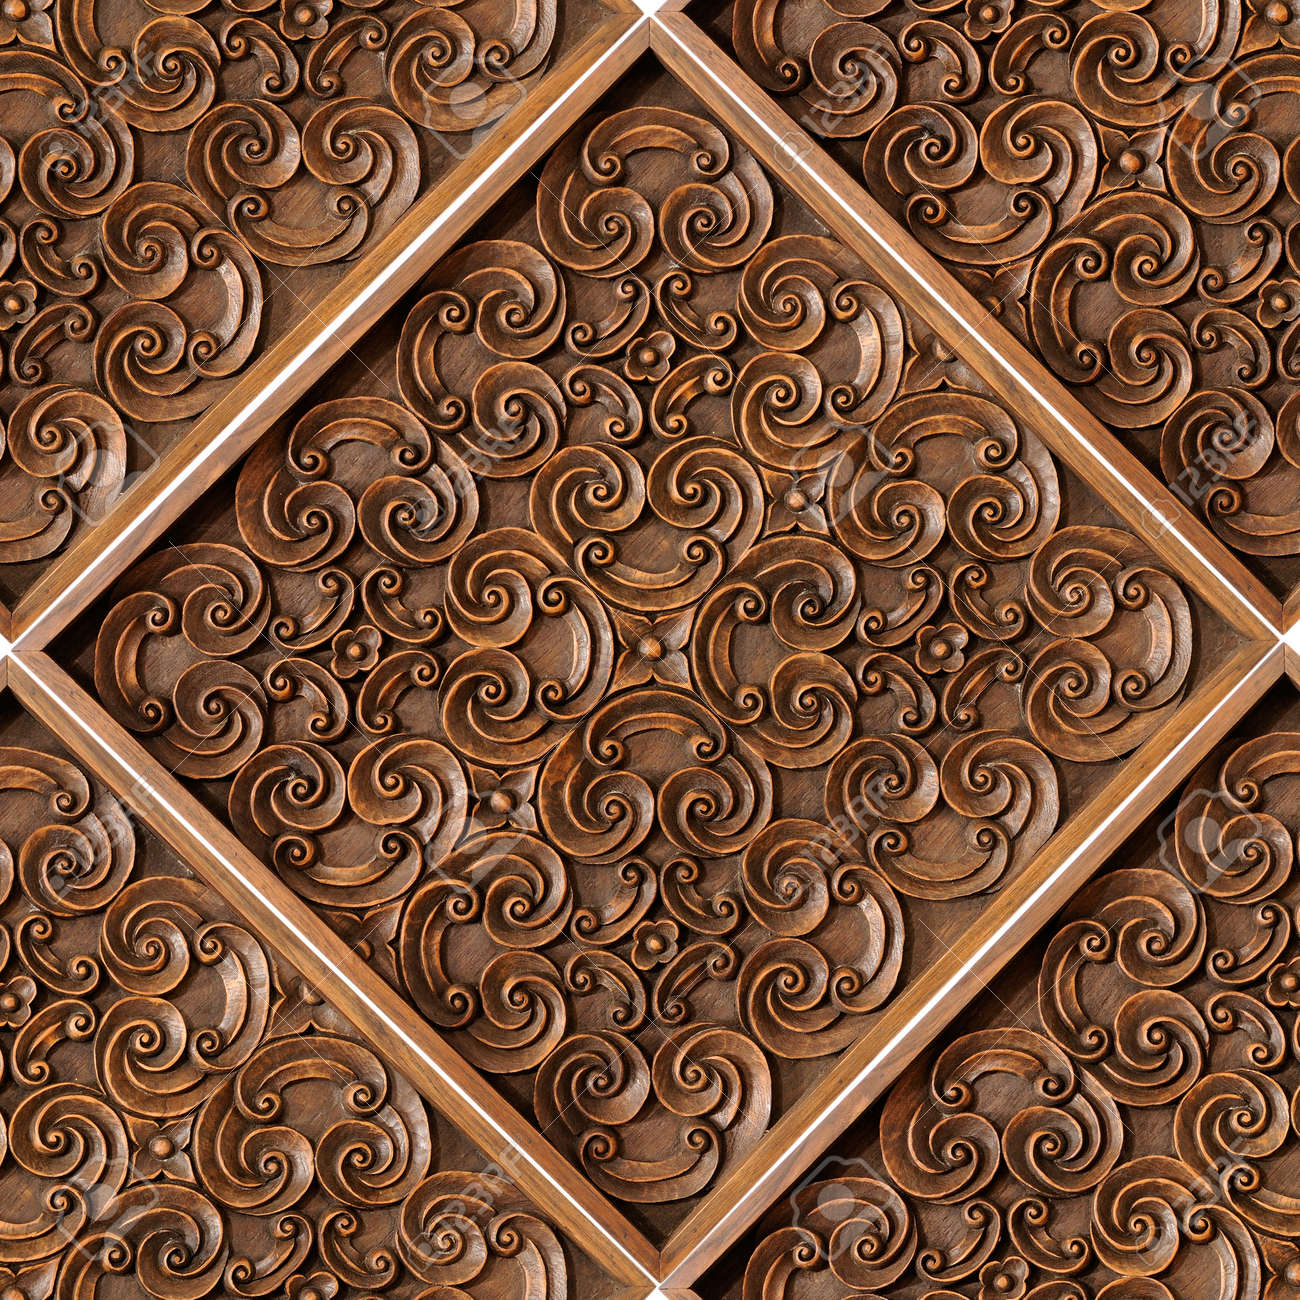 Wood thai pattern handmade wood carvings chiangmai thailand stock